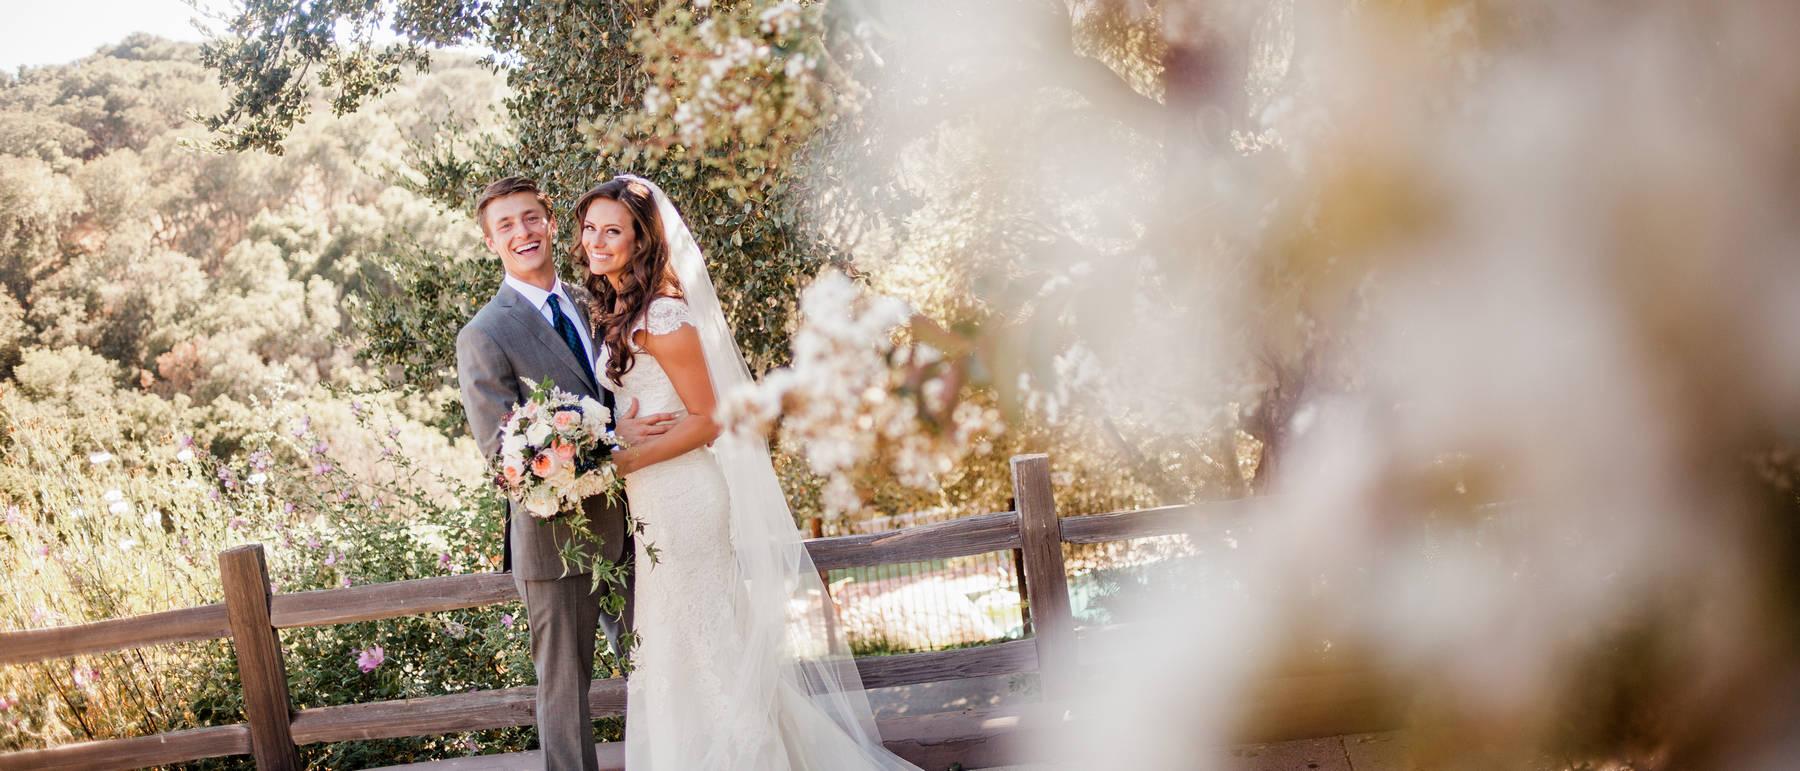 johnandjoseph-wedding-photographer-hz-slider-307